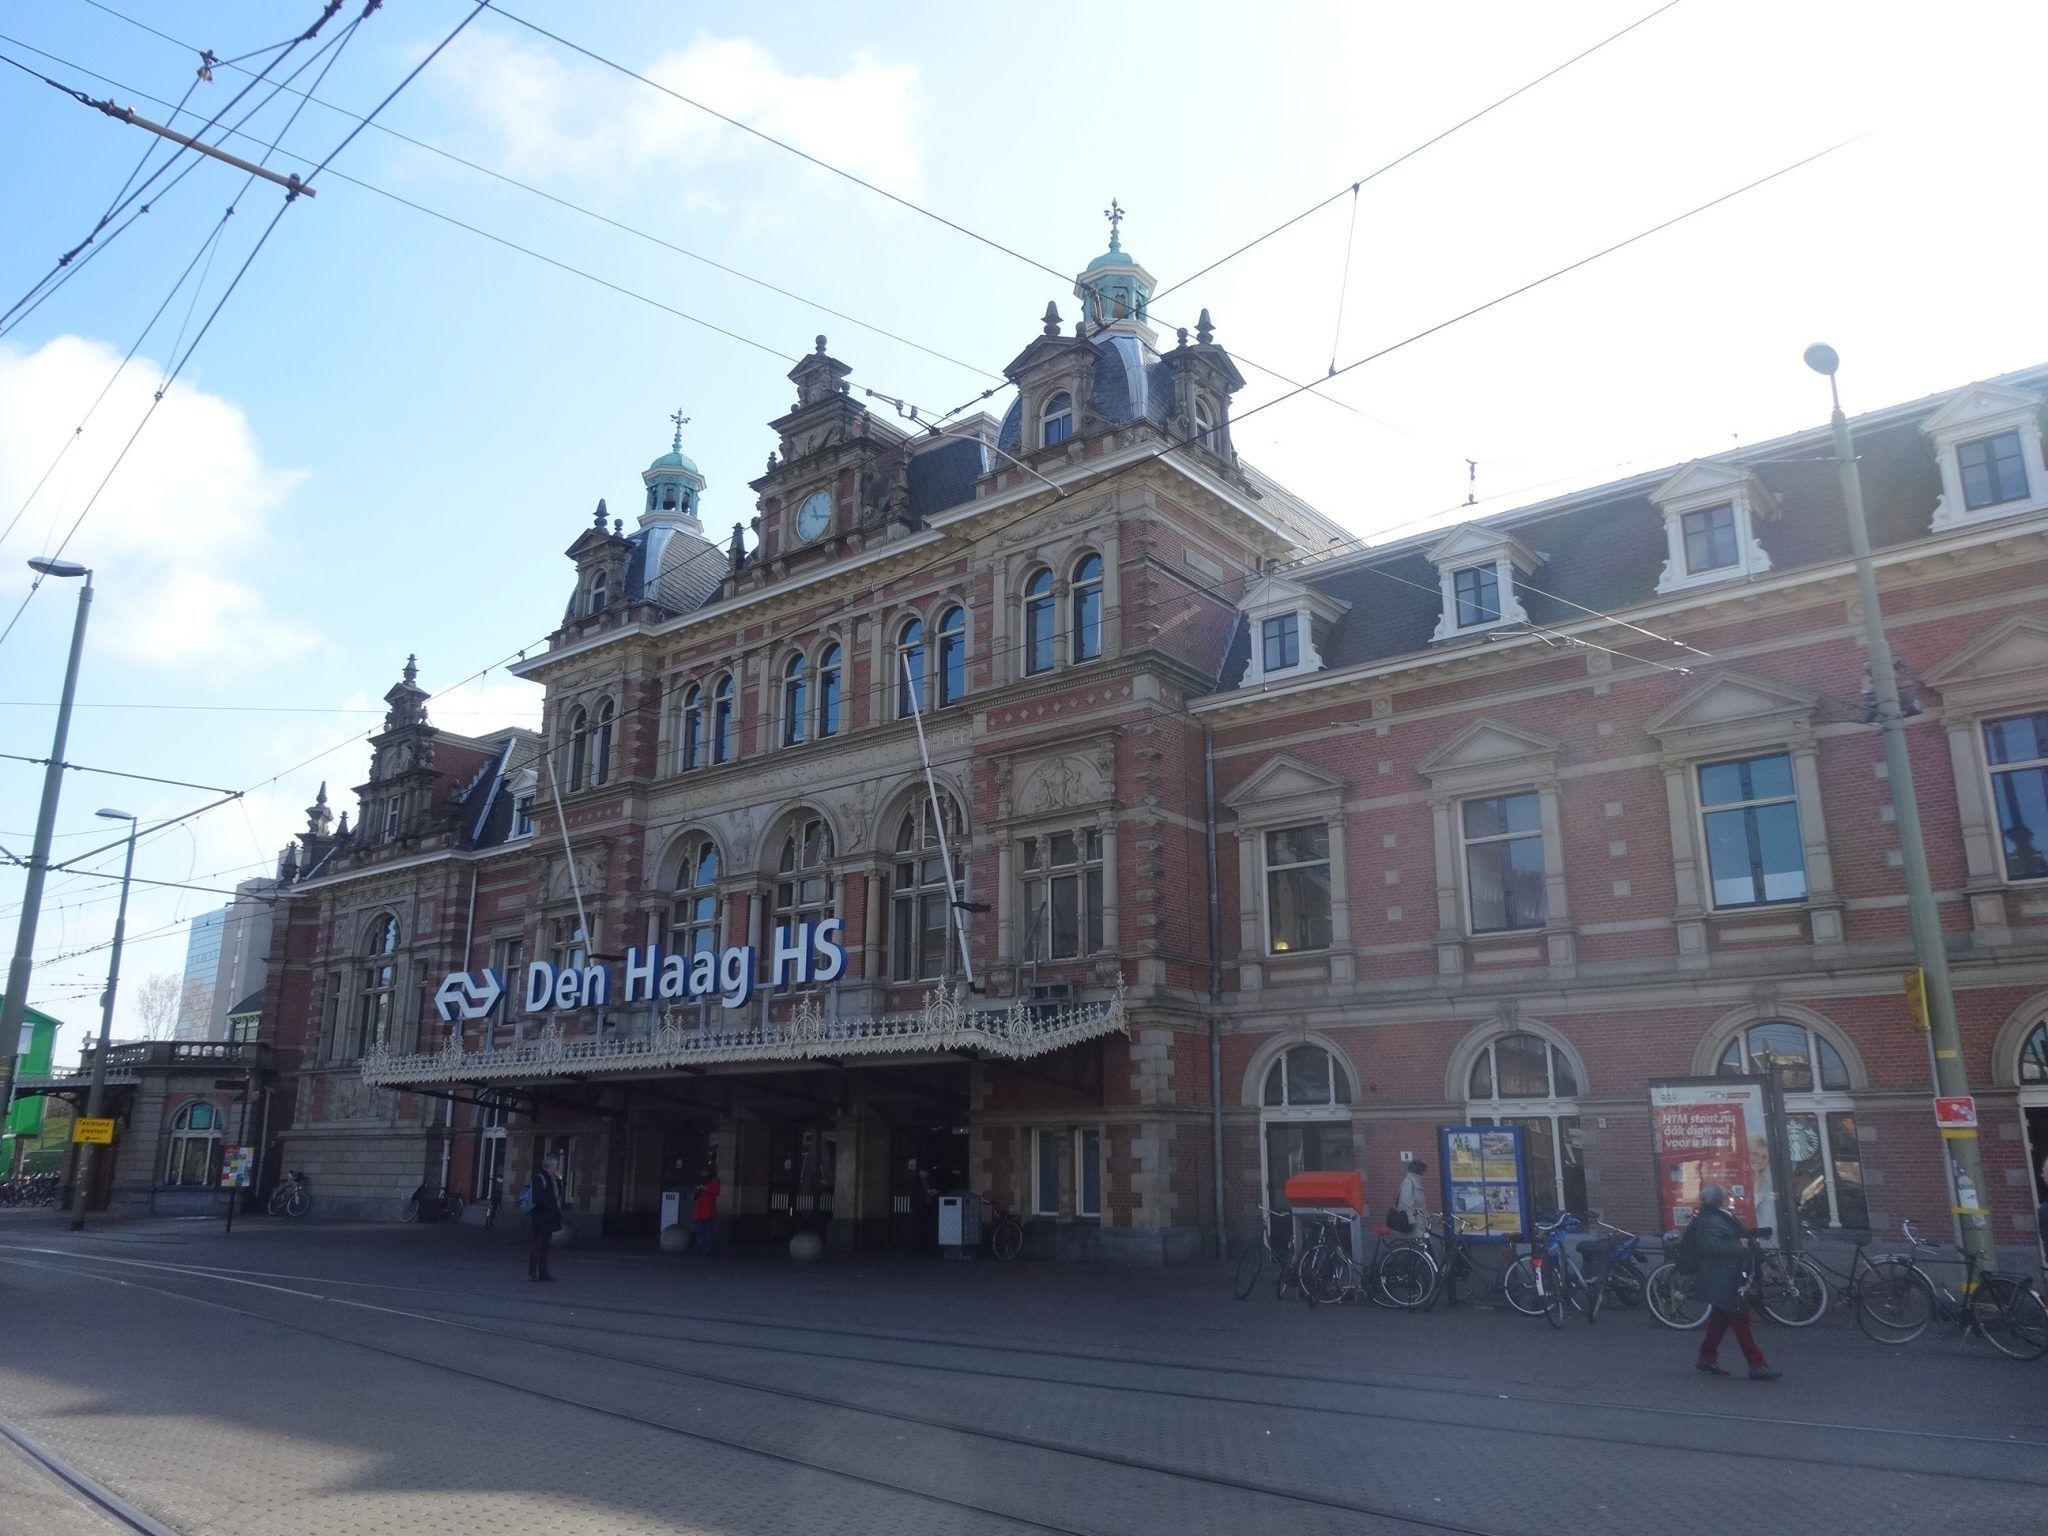 Wandelen tussen Den Haag HS Centraal Station